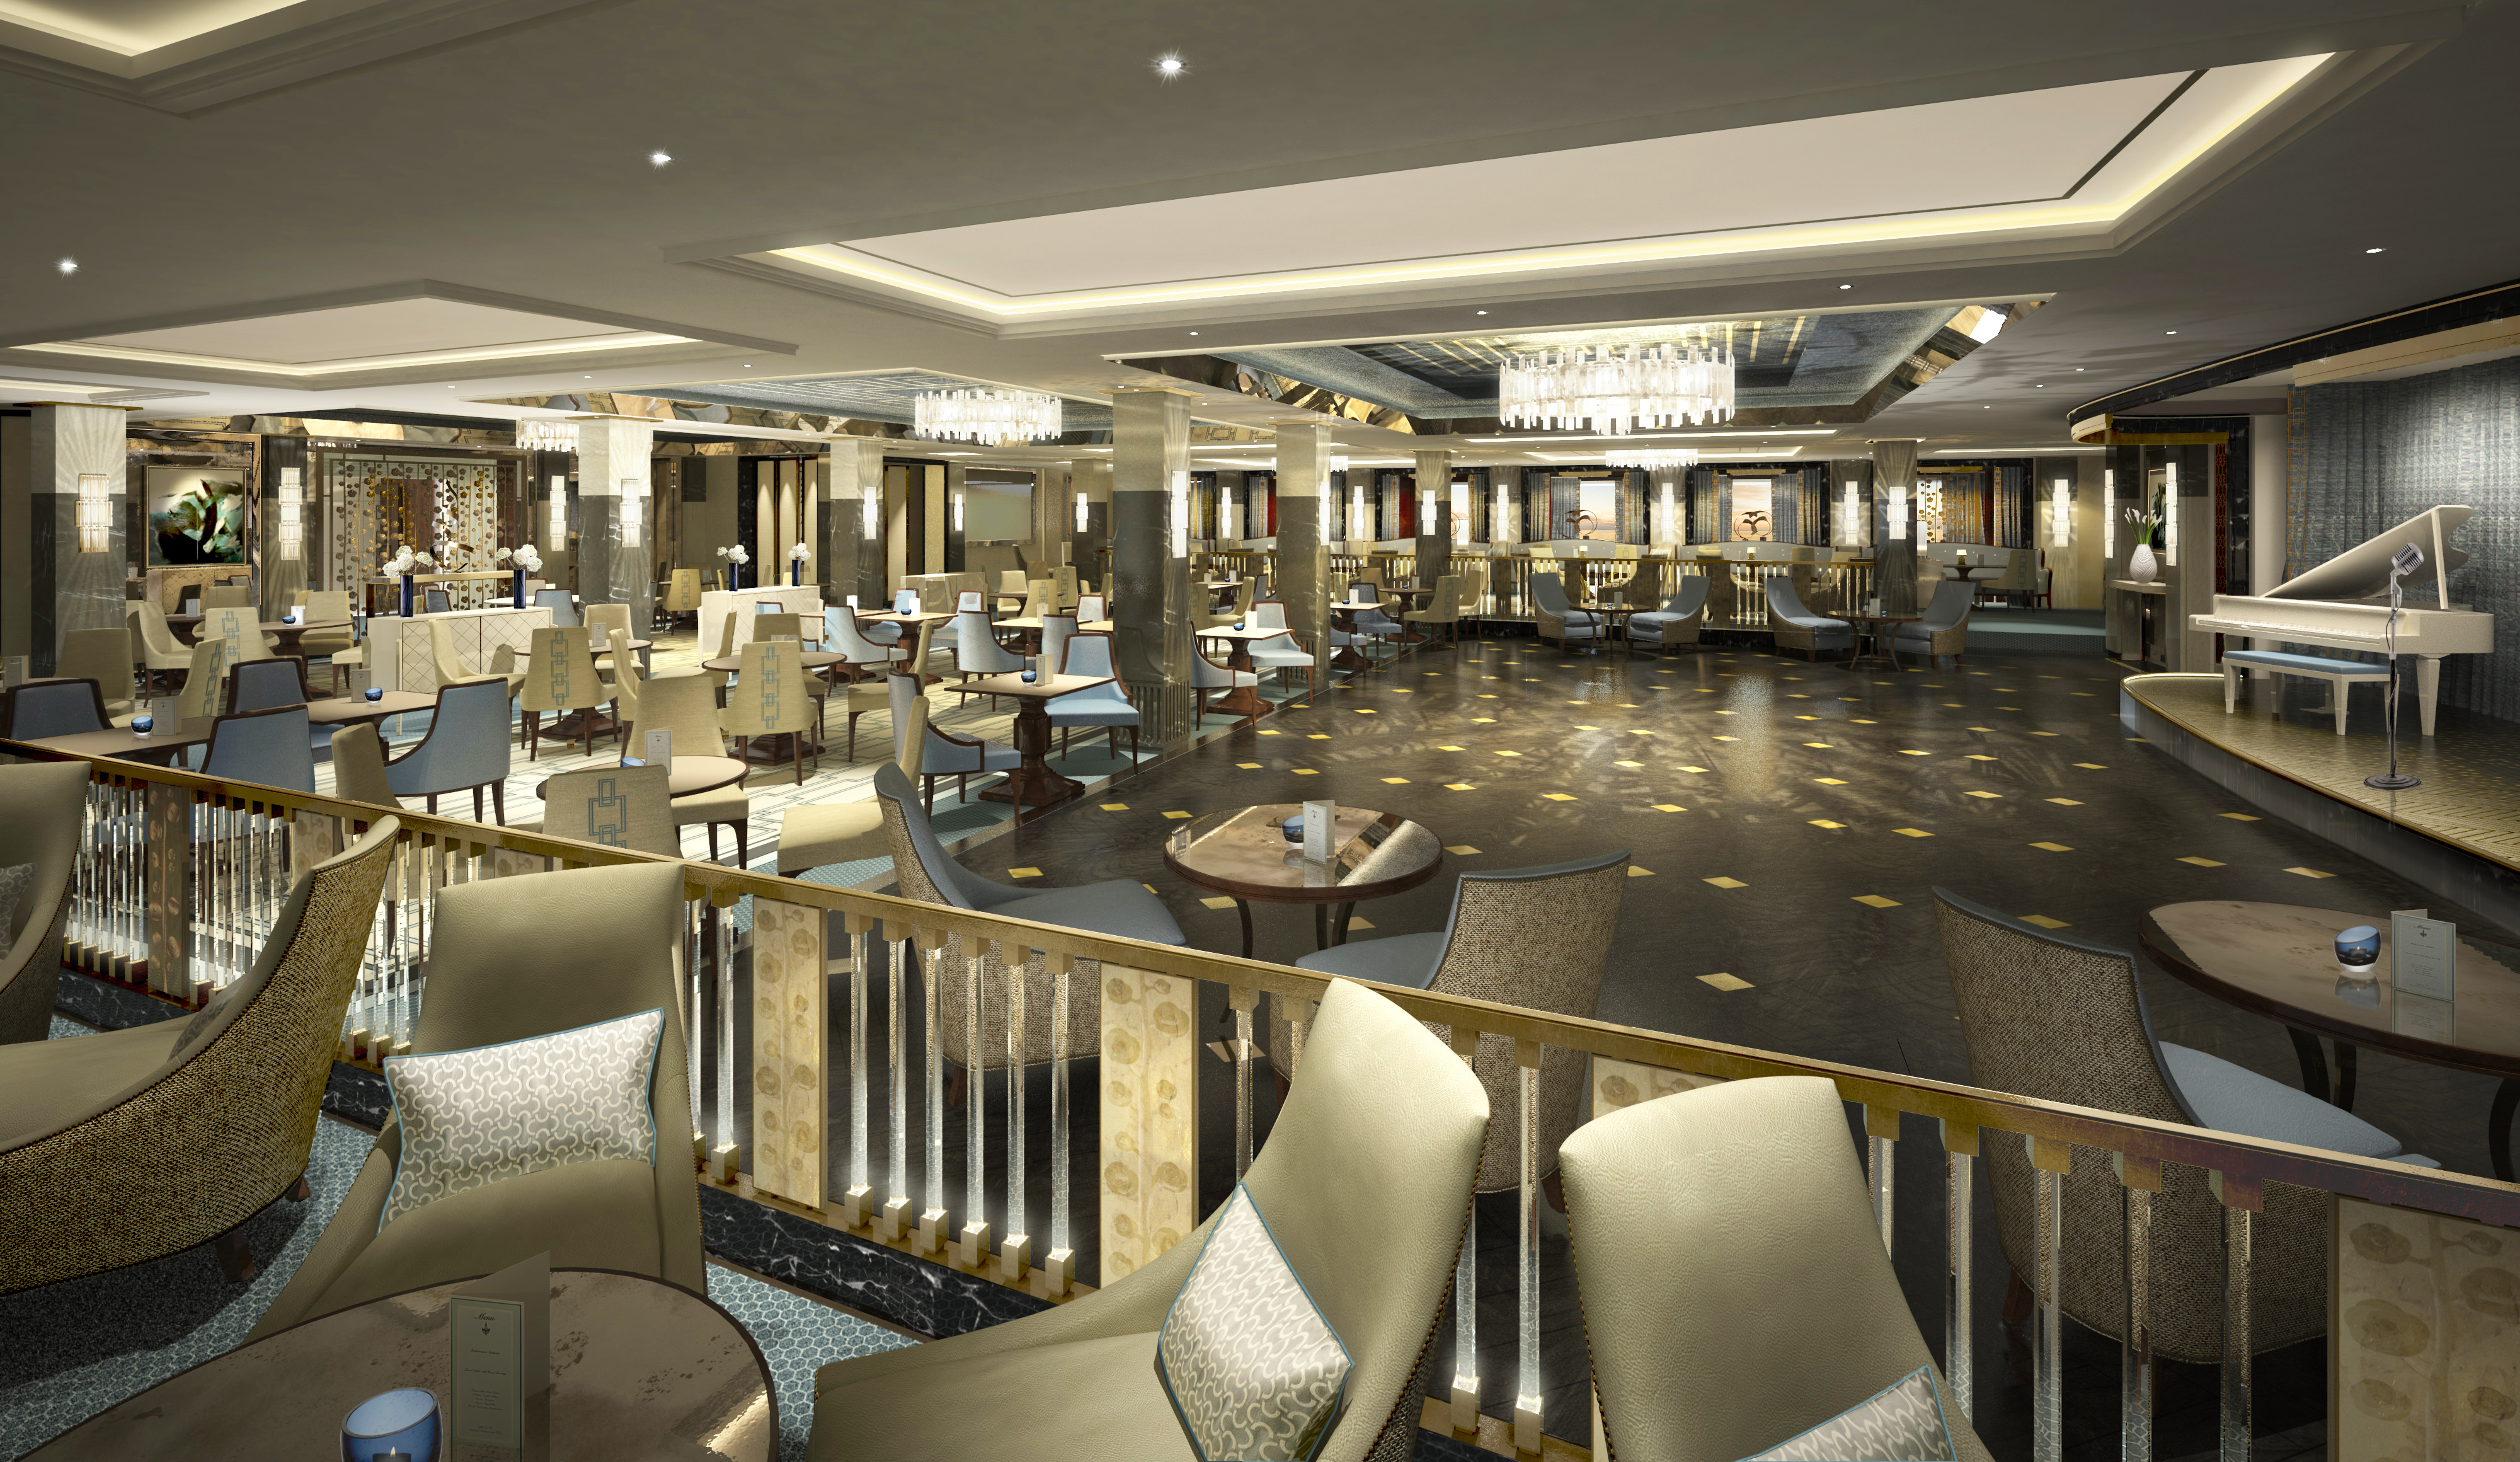 Take A Look Inside PO Cruises Britannia  NEW IMAGES